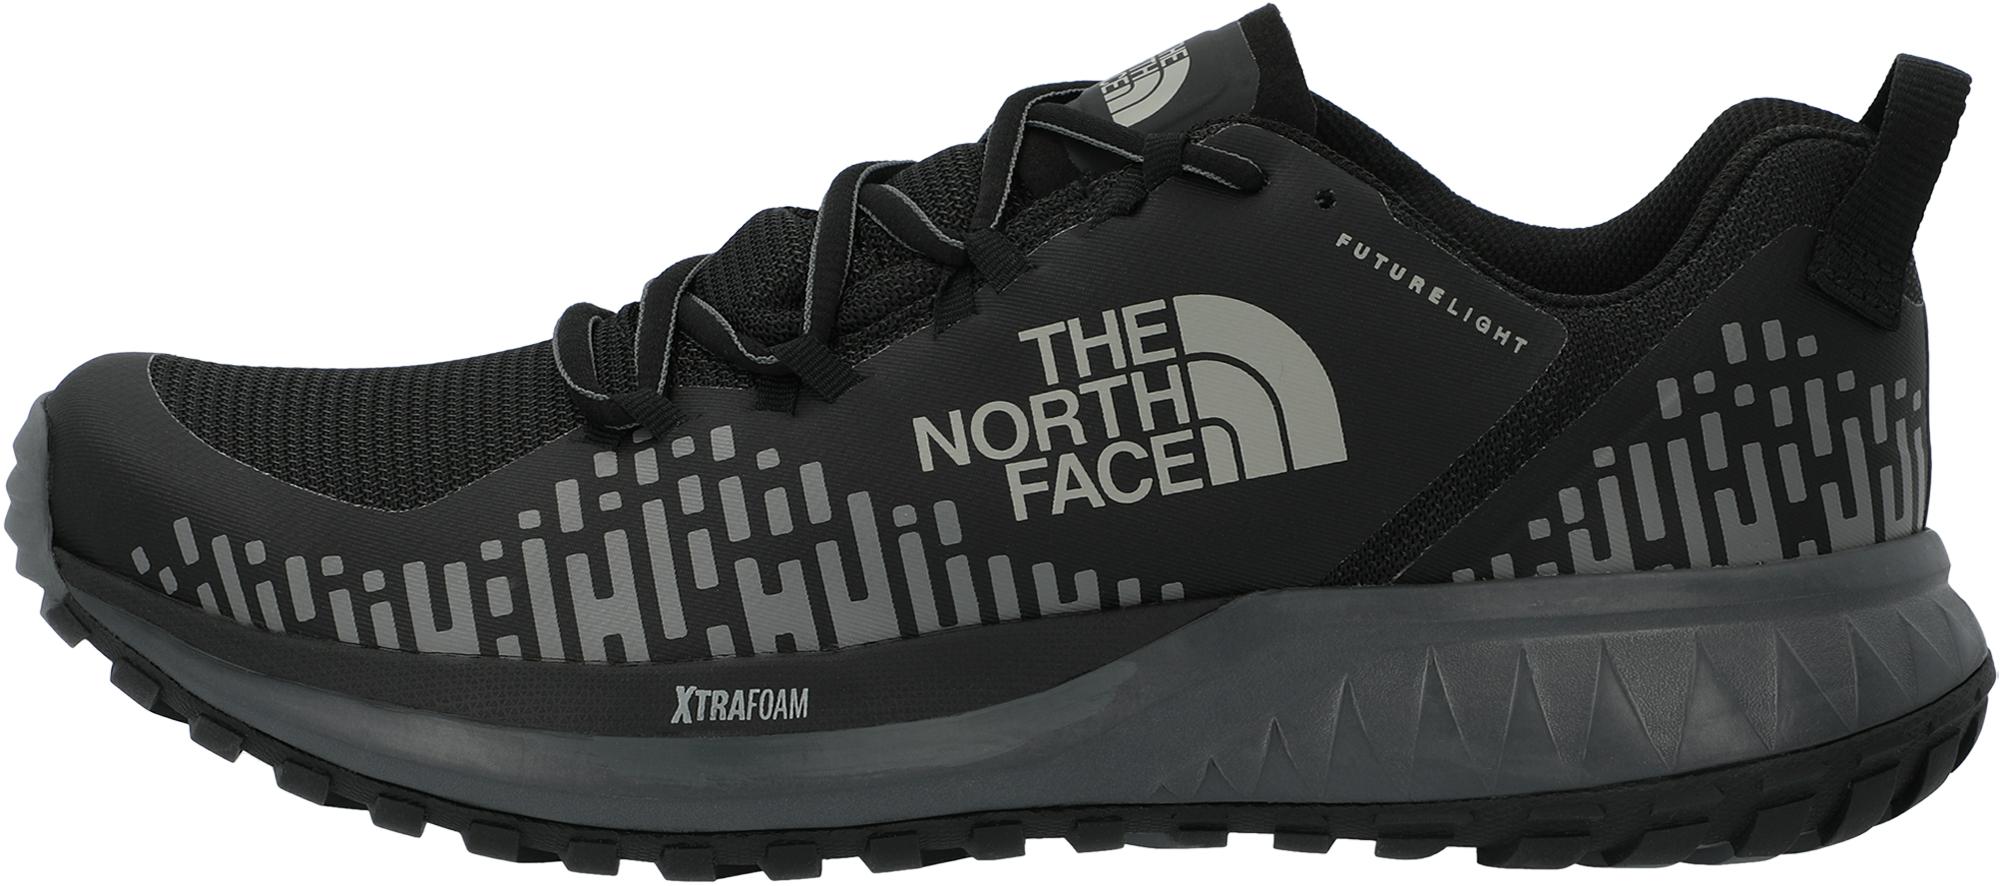 цена The North Face Полуботинки мужские The North Face Ultra Endurance XF FutureLight™, размер 40 онлайн в 2017 году